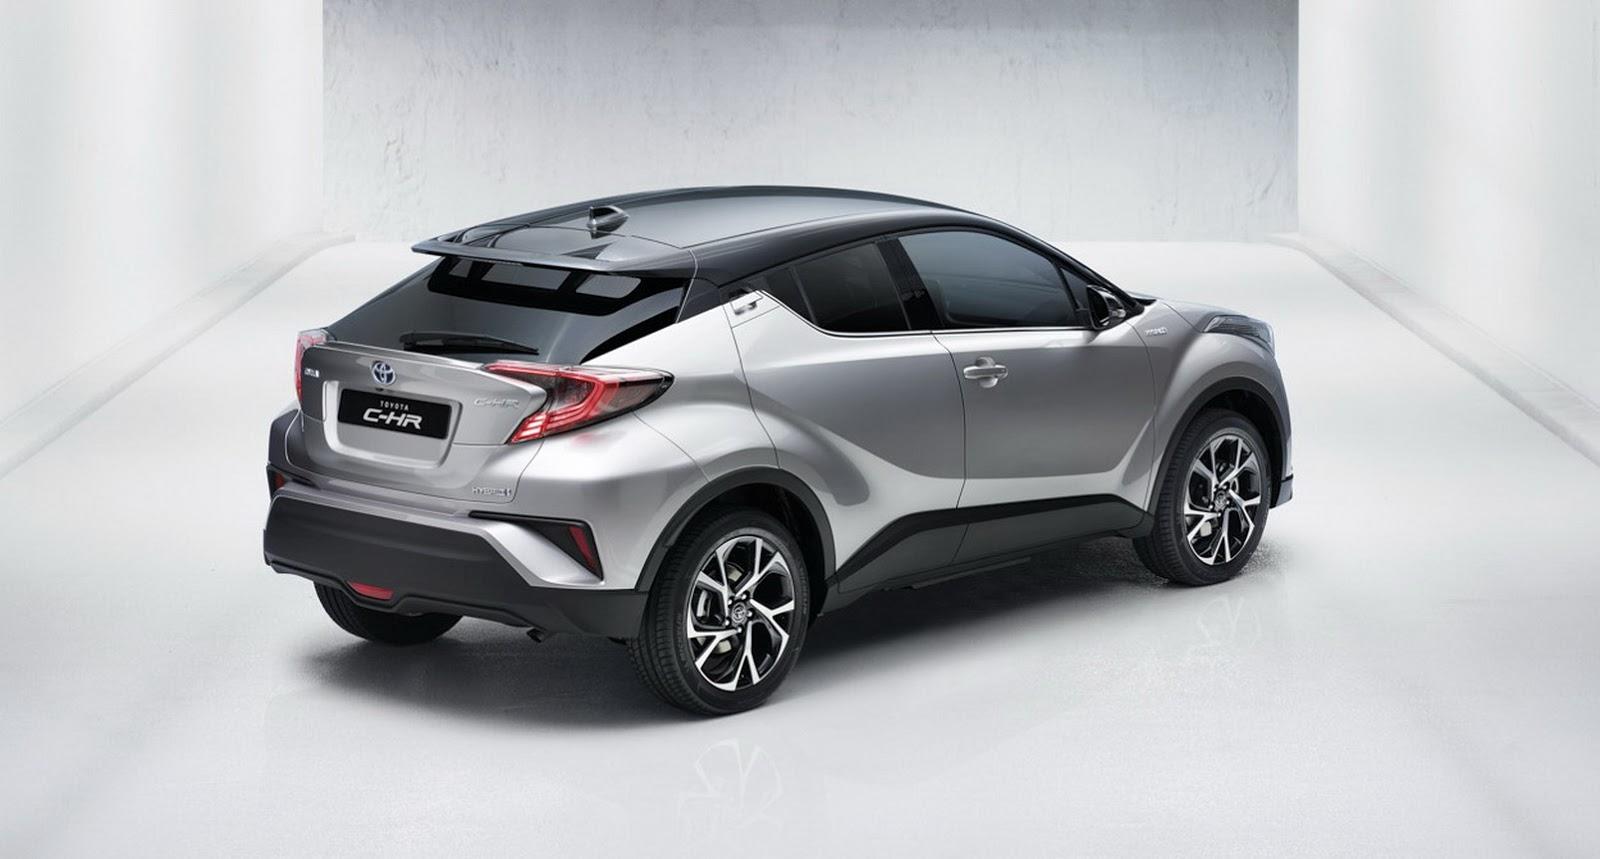 New Toyota C-HR Gets 1.2L Turbo, 2.0L And 1.8L Hybrid ...